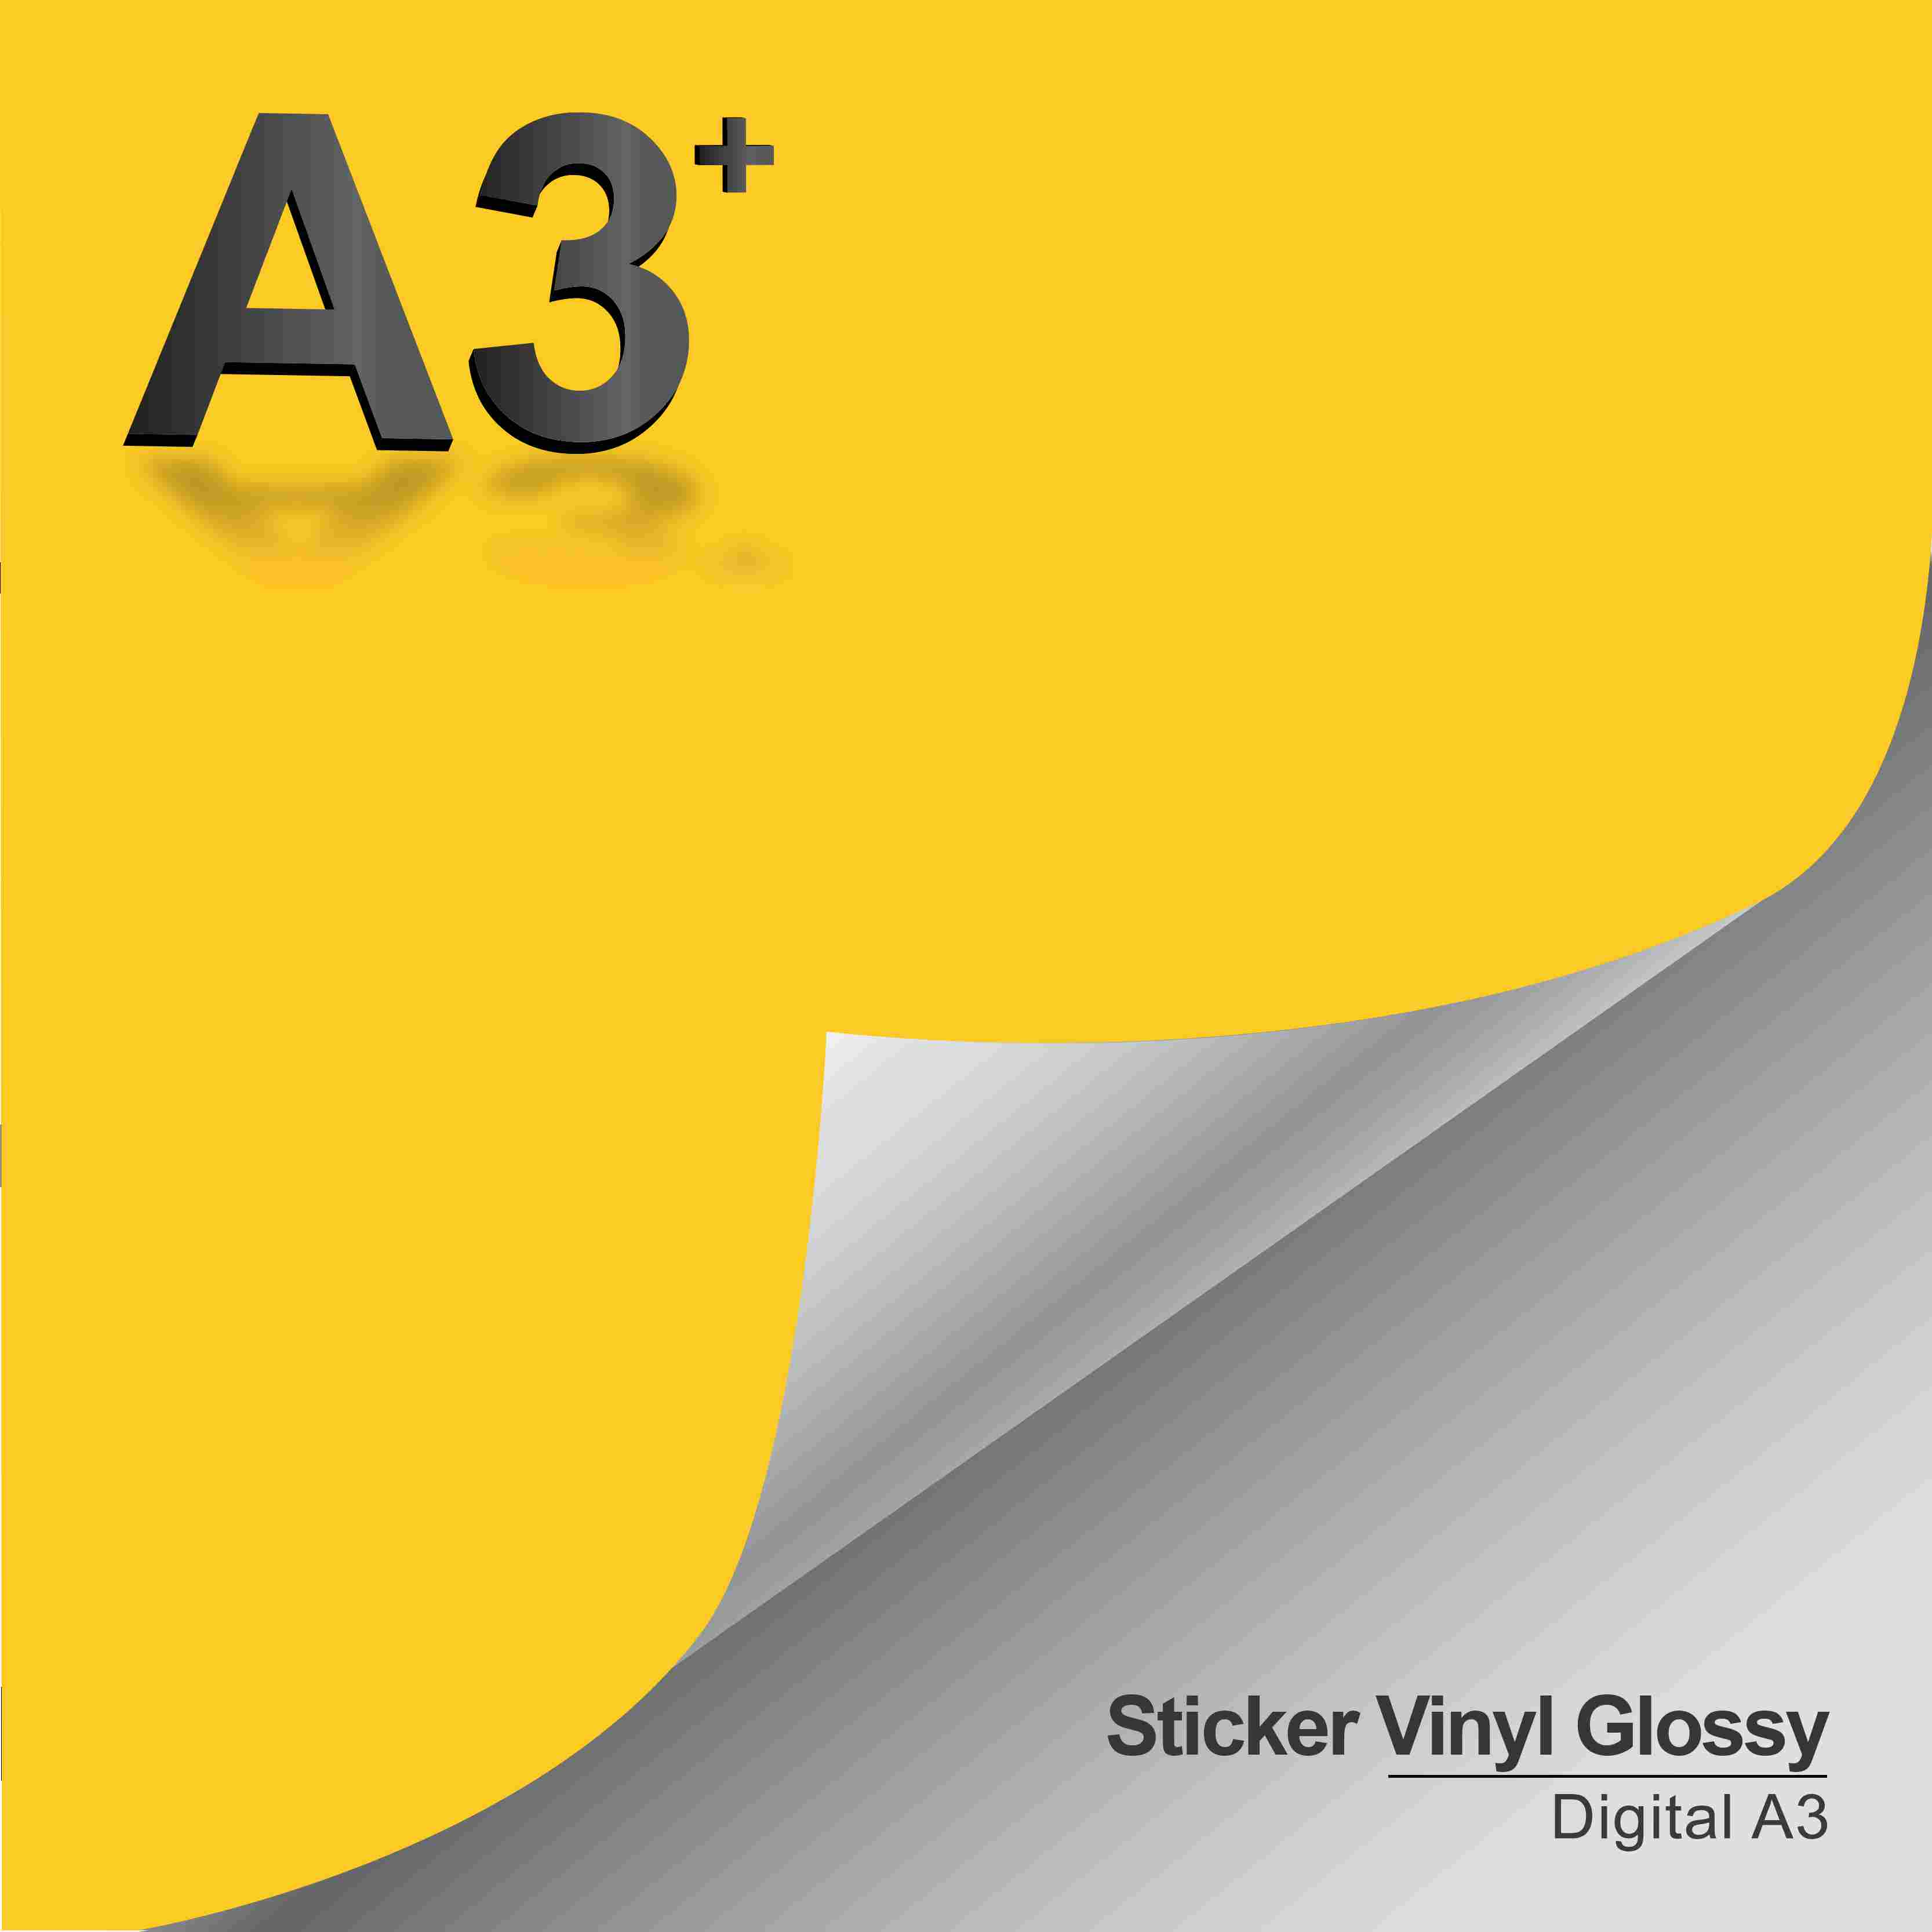 Print & Cut Sticker Vinyl Glossy A3